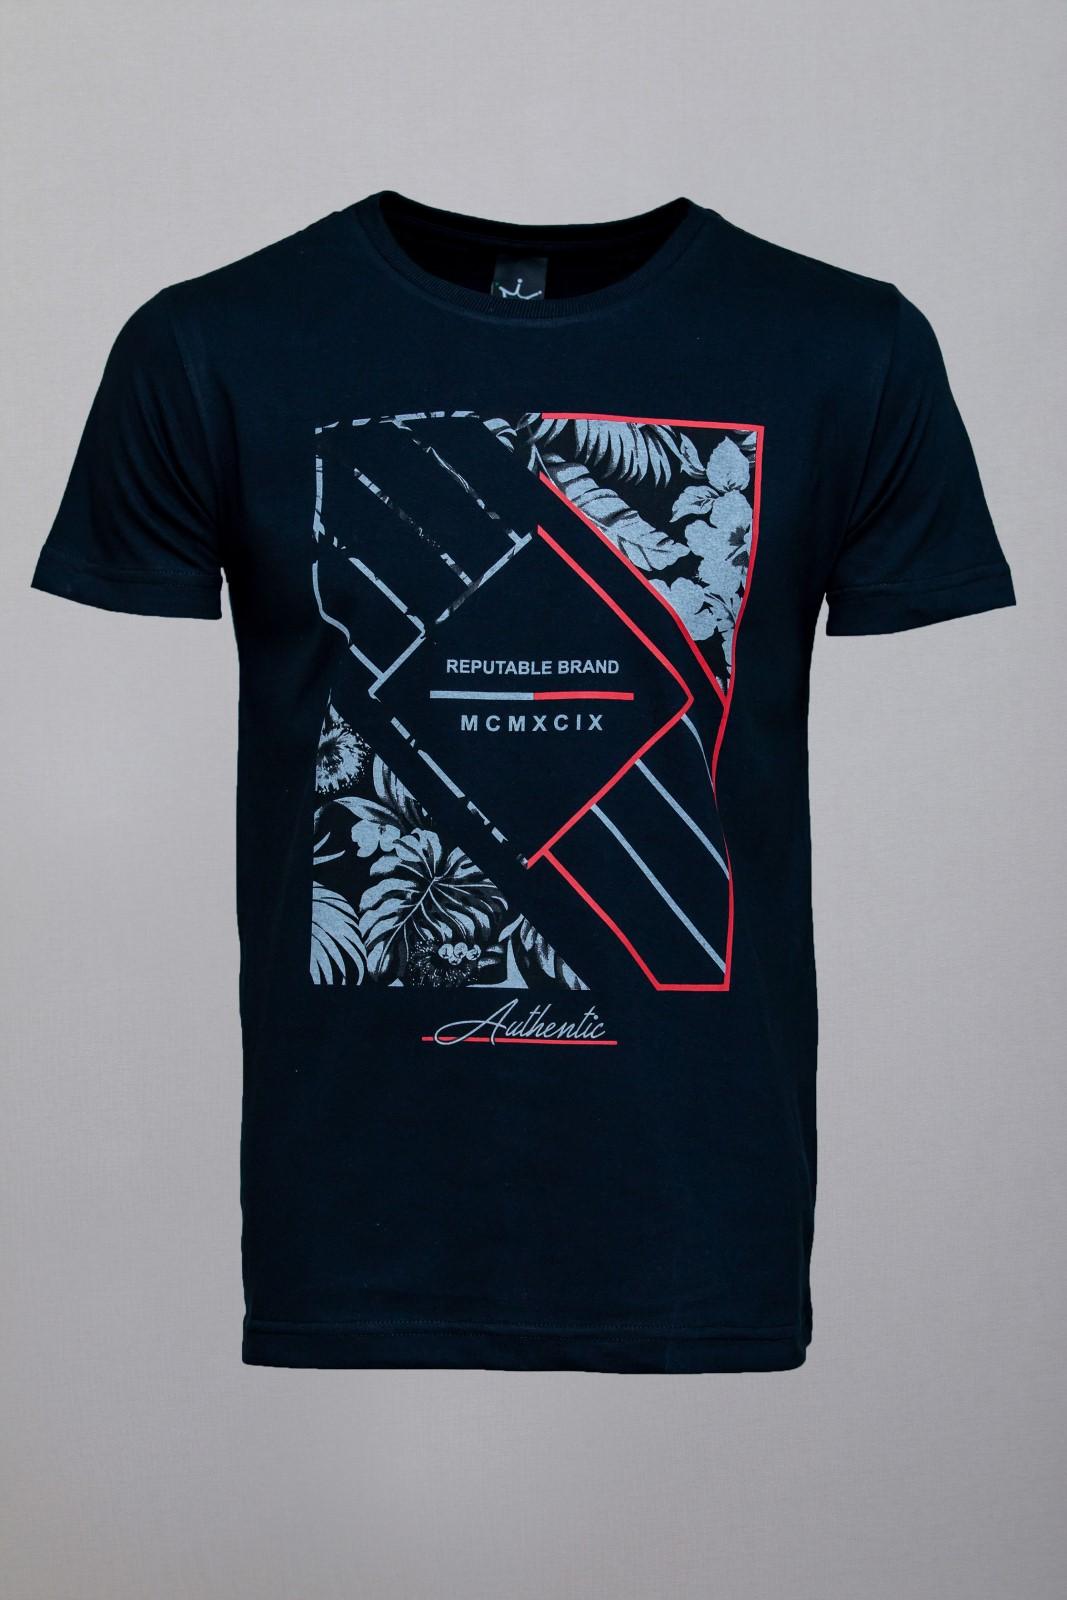 Camiseta CoolWave Reputable Brand